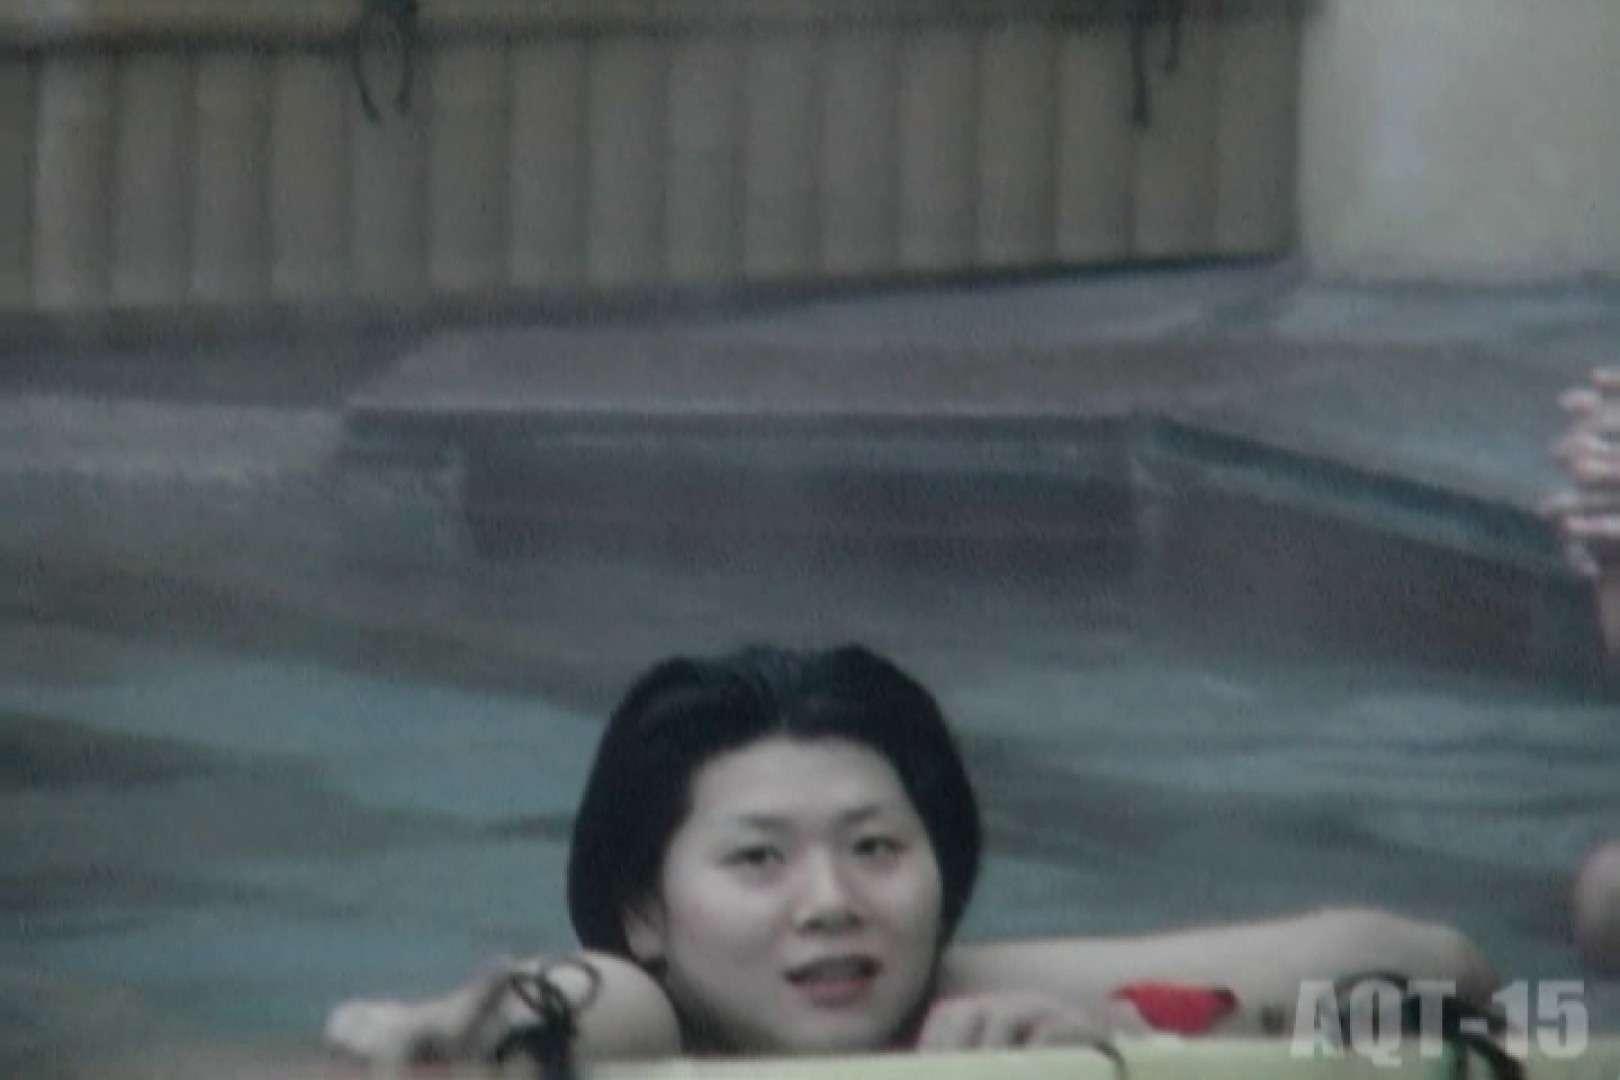 Aquaな露天風呂Vol.837 エッチな盗撮 エロ無料画像 103pic 63